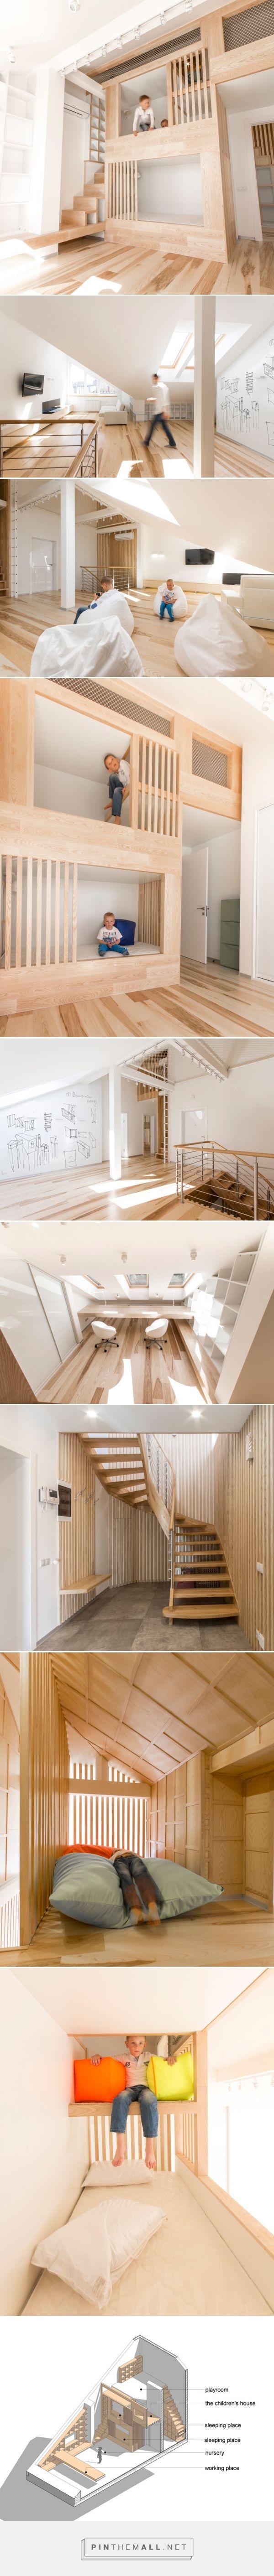 f2ac023372baf3c5bd3312176031f9e9--interior-architecture-moscow Luxe De Abri Moto Exterieur Concept